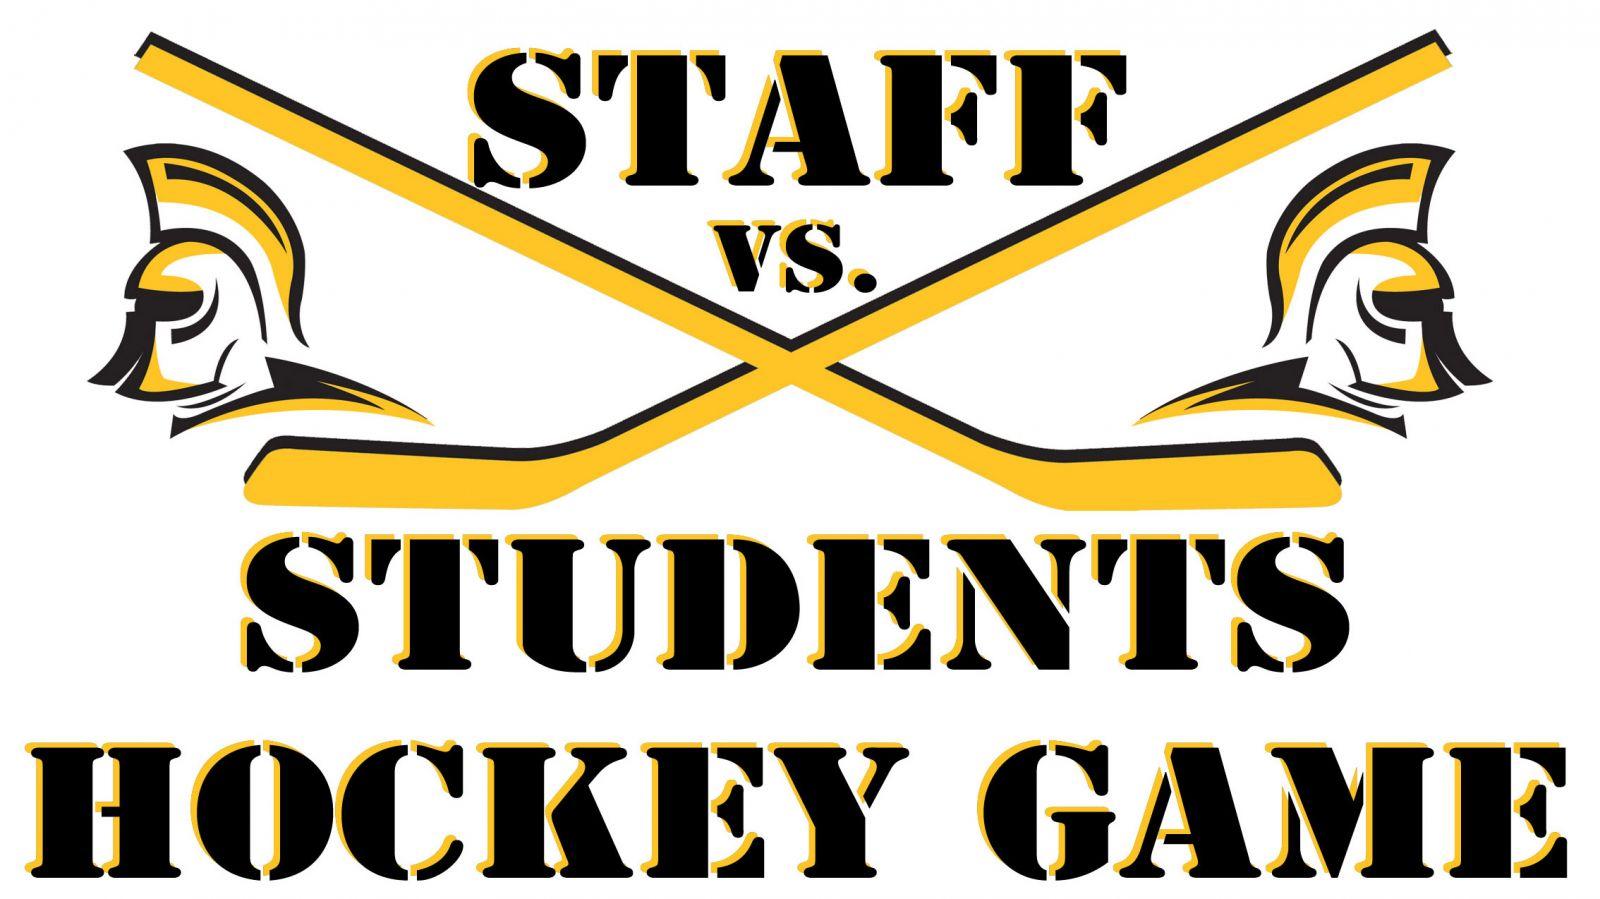 staff vs student hockey game